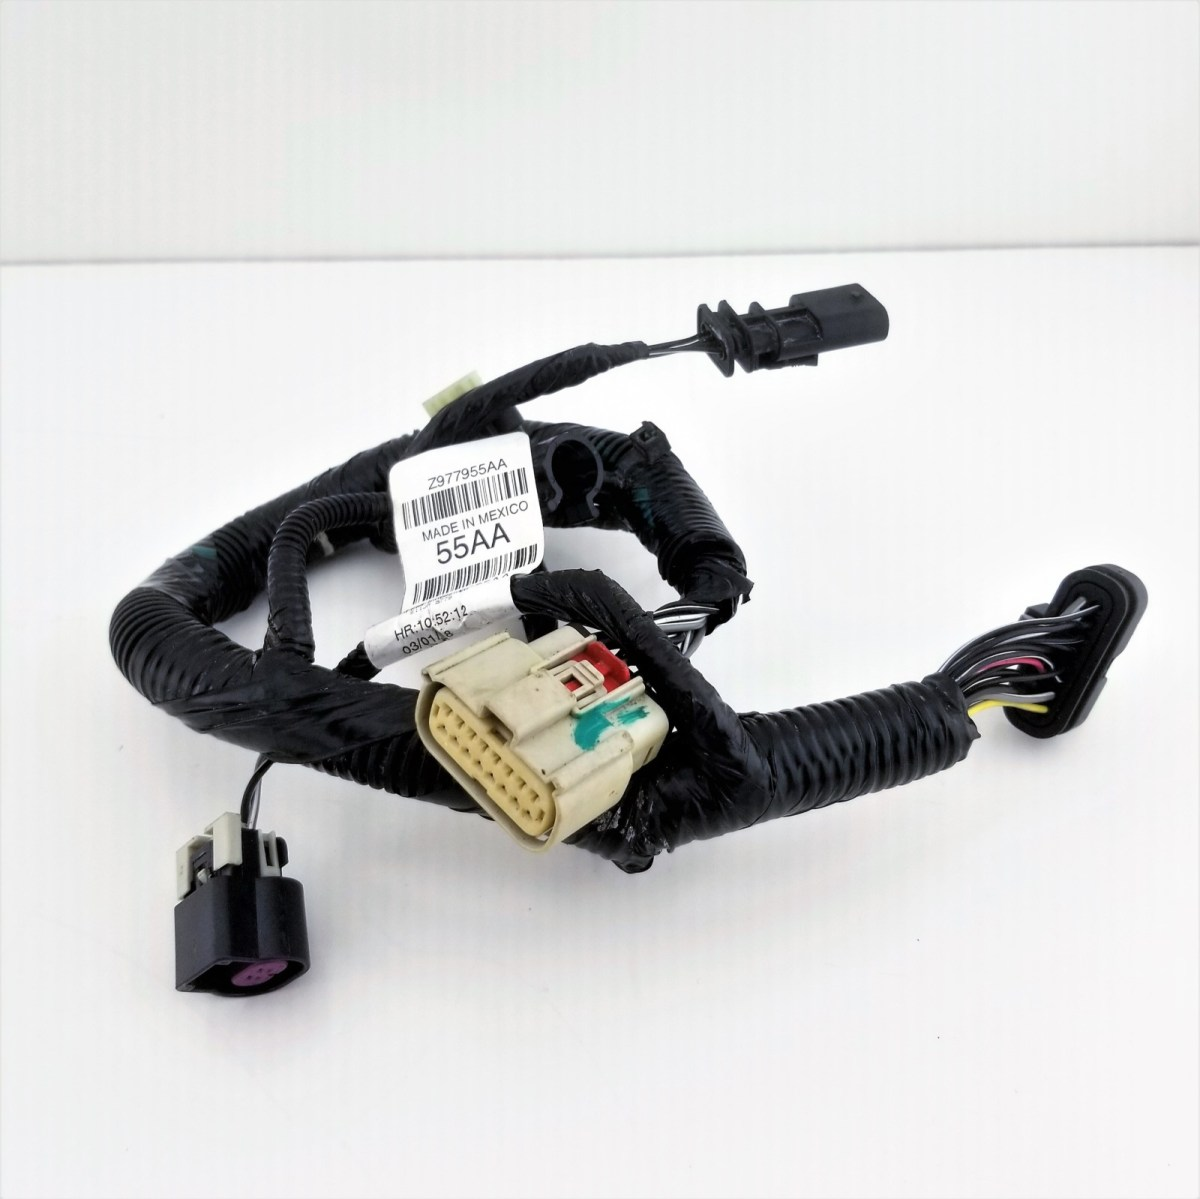 Genuine Cummins Diesel Exhaust Fluid  U2013 Ram 6 7 Def System Main Wiring Harness  U2013 7620655aa